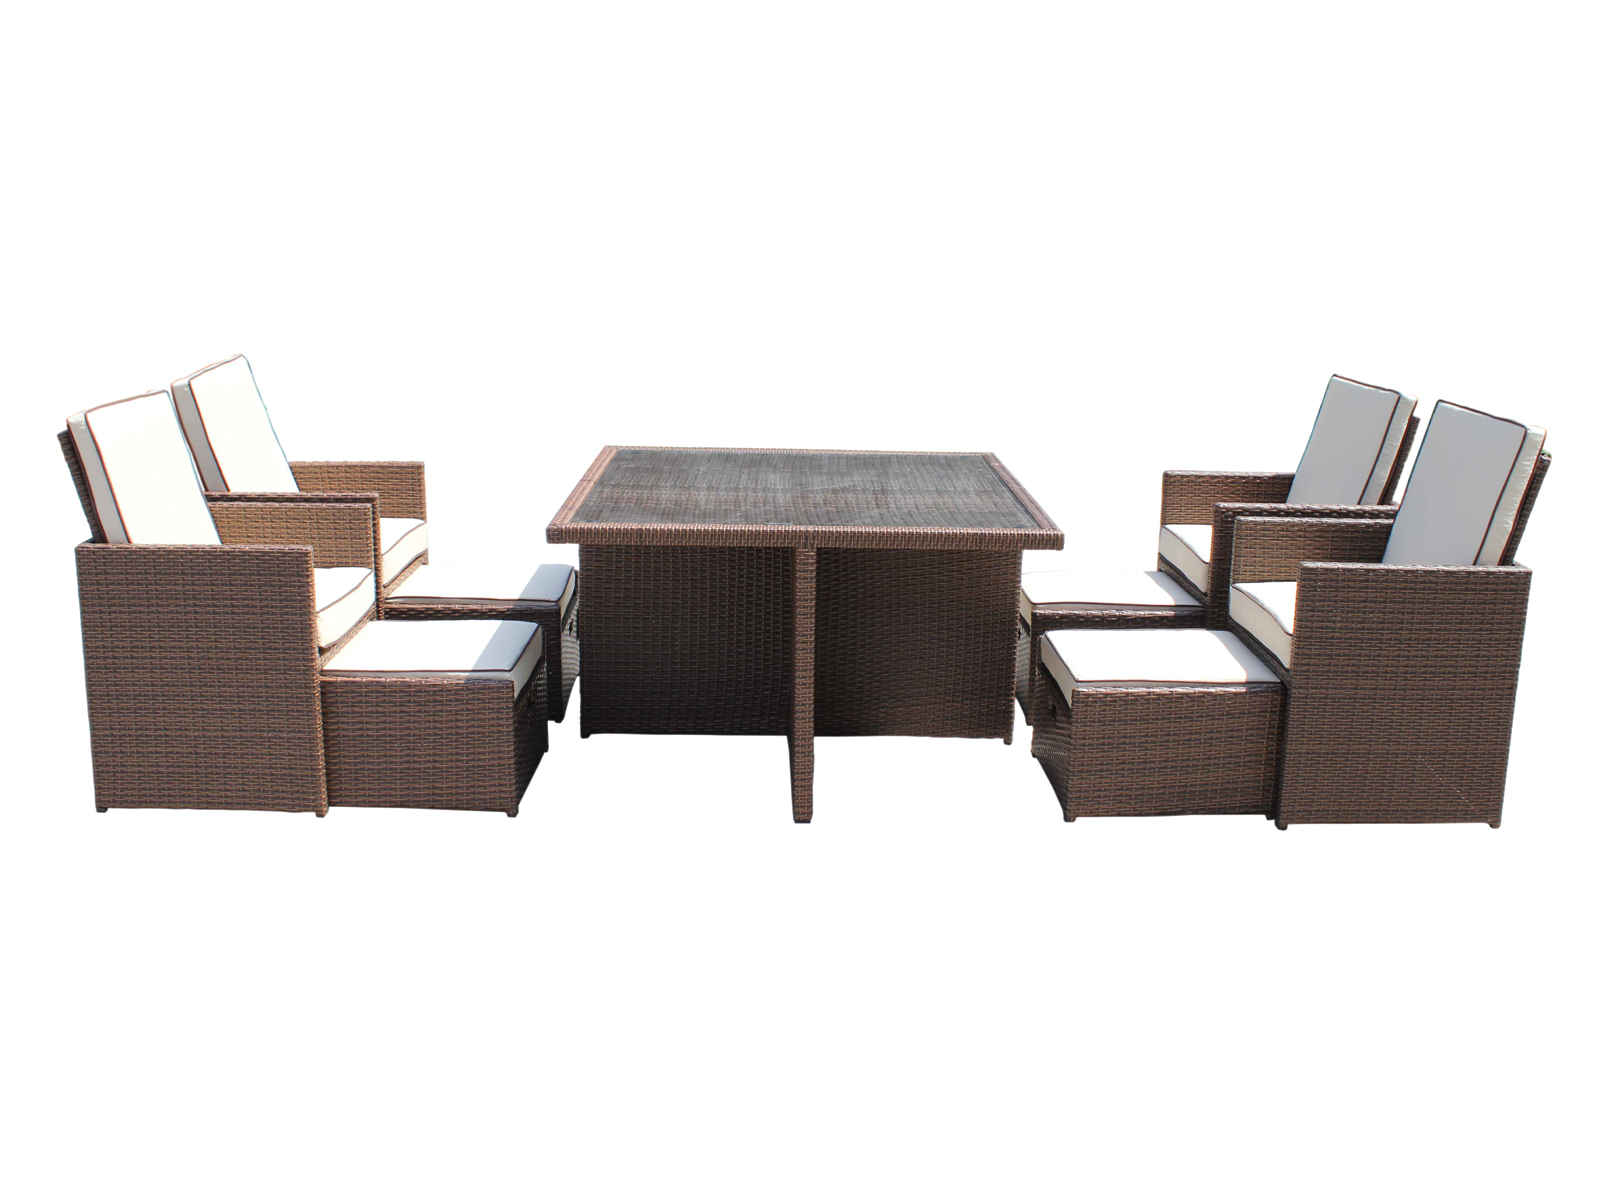 Outdoor rattan furniture barcelona 9 piece garden cube set for Outdoor furniture 9 piece